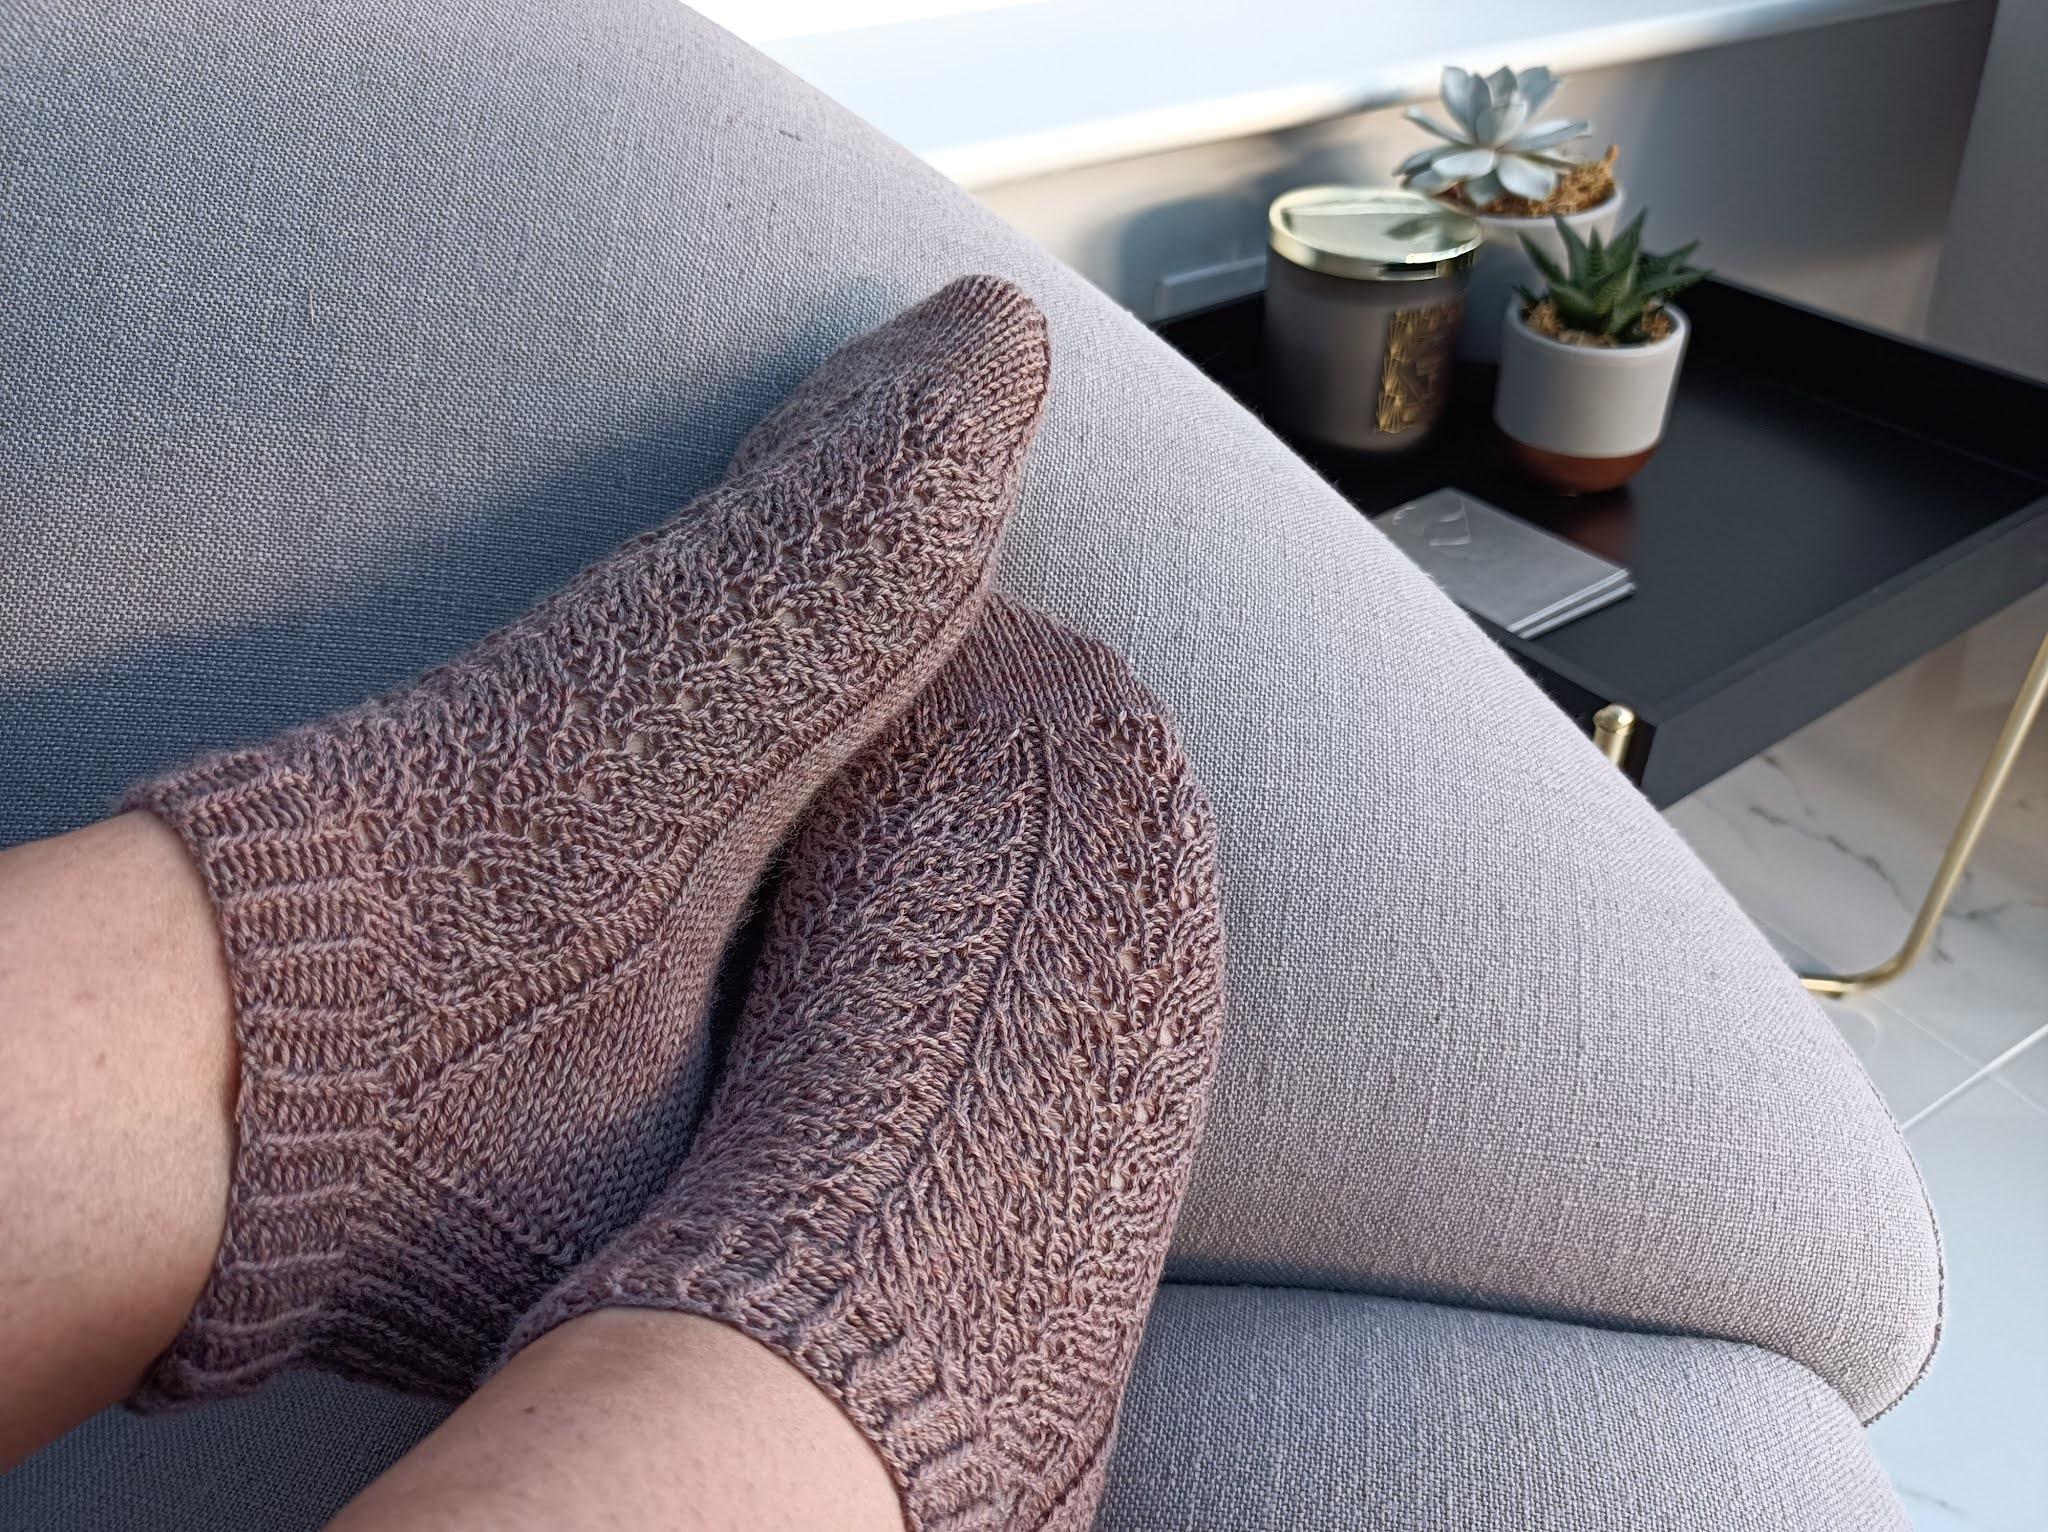 Cliff Walk Socks by Curious Handmade, Handmade Sock Society Season 2, shortie version